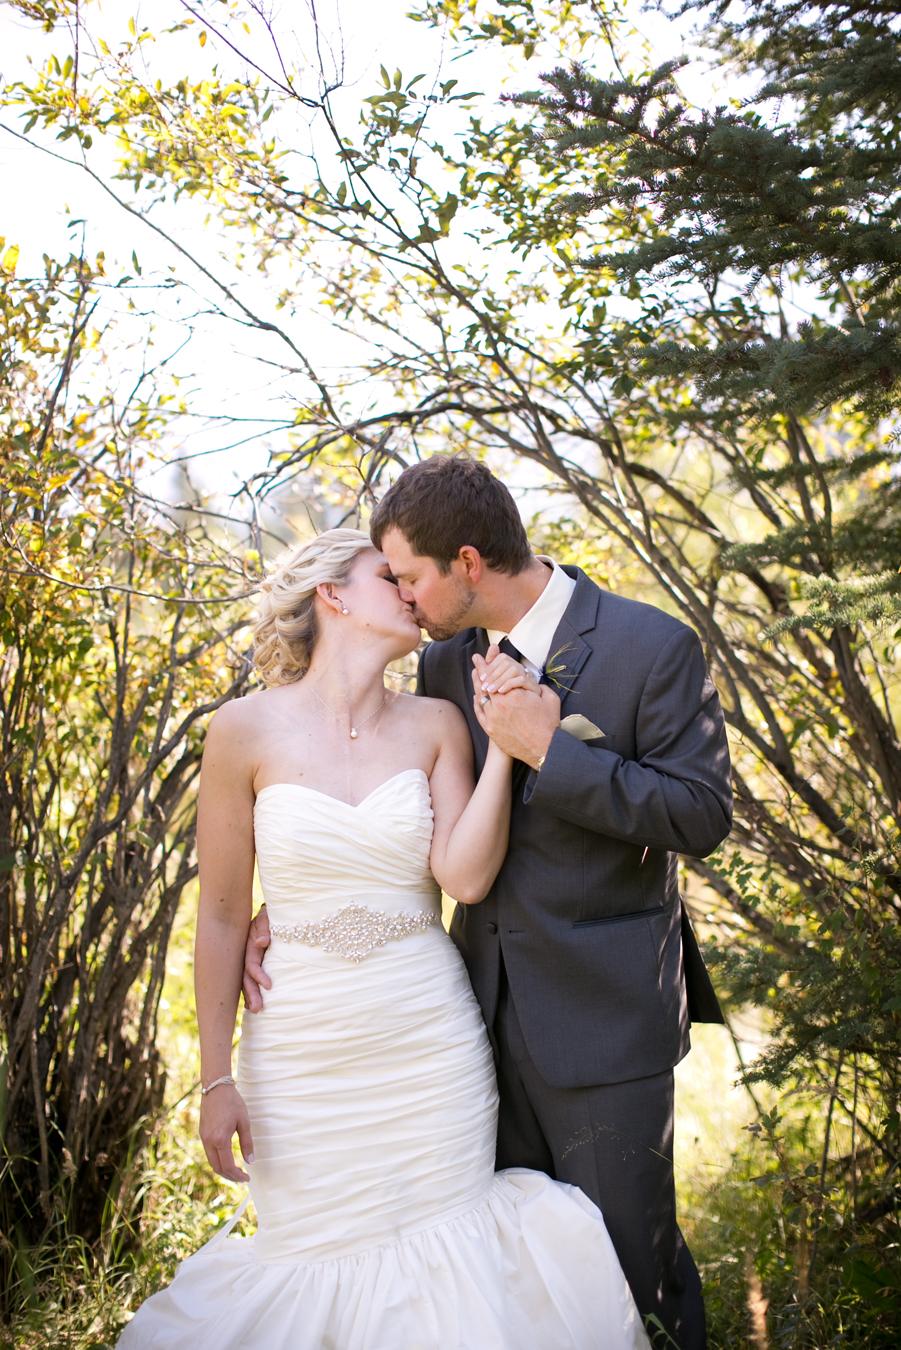 megan amp ryan married canmore silvertip wedding